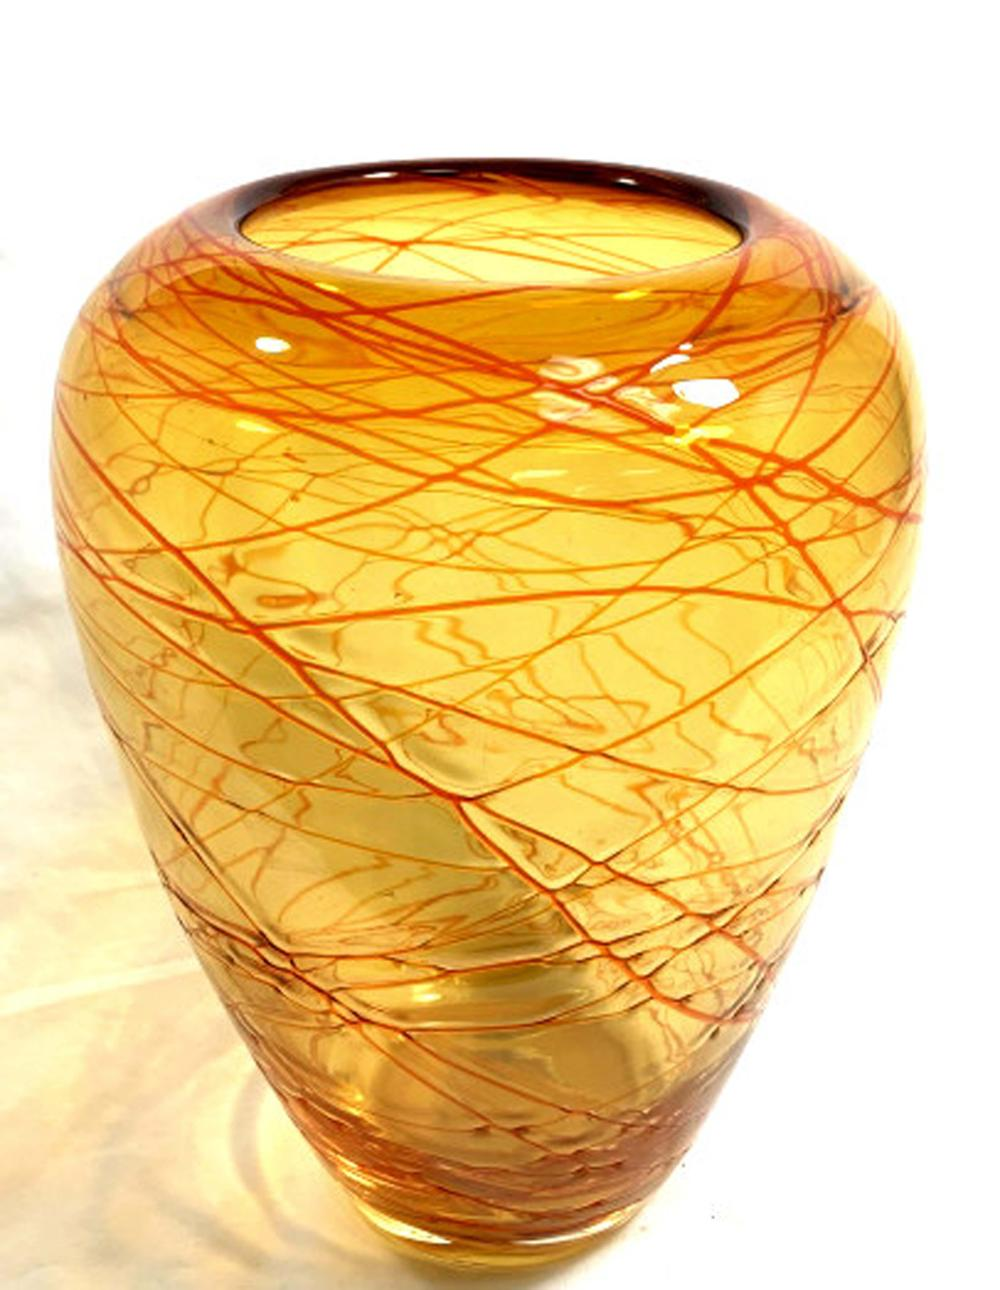 ABSTRACT ORANGE SWIRLING LINES ART GLASS VASE